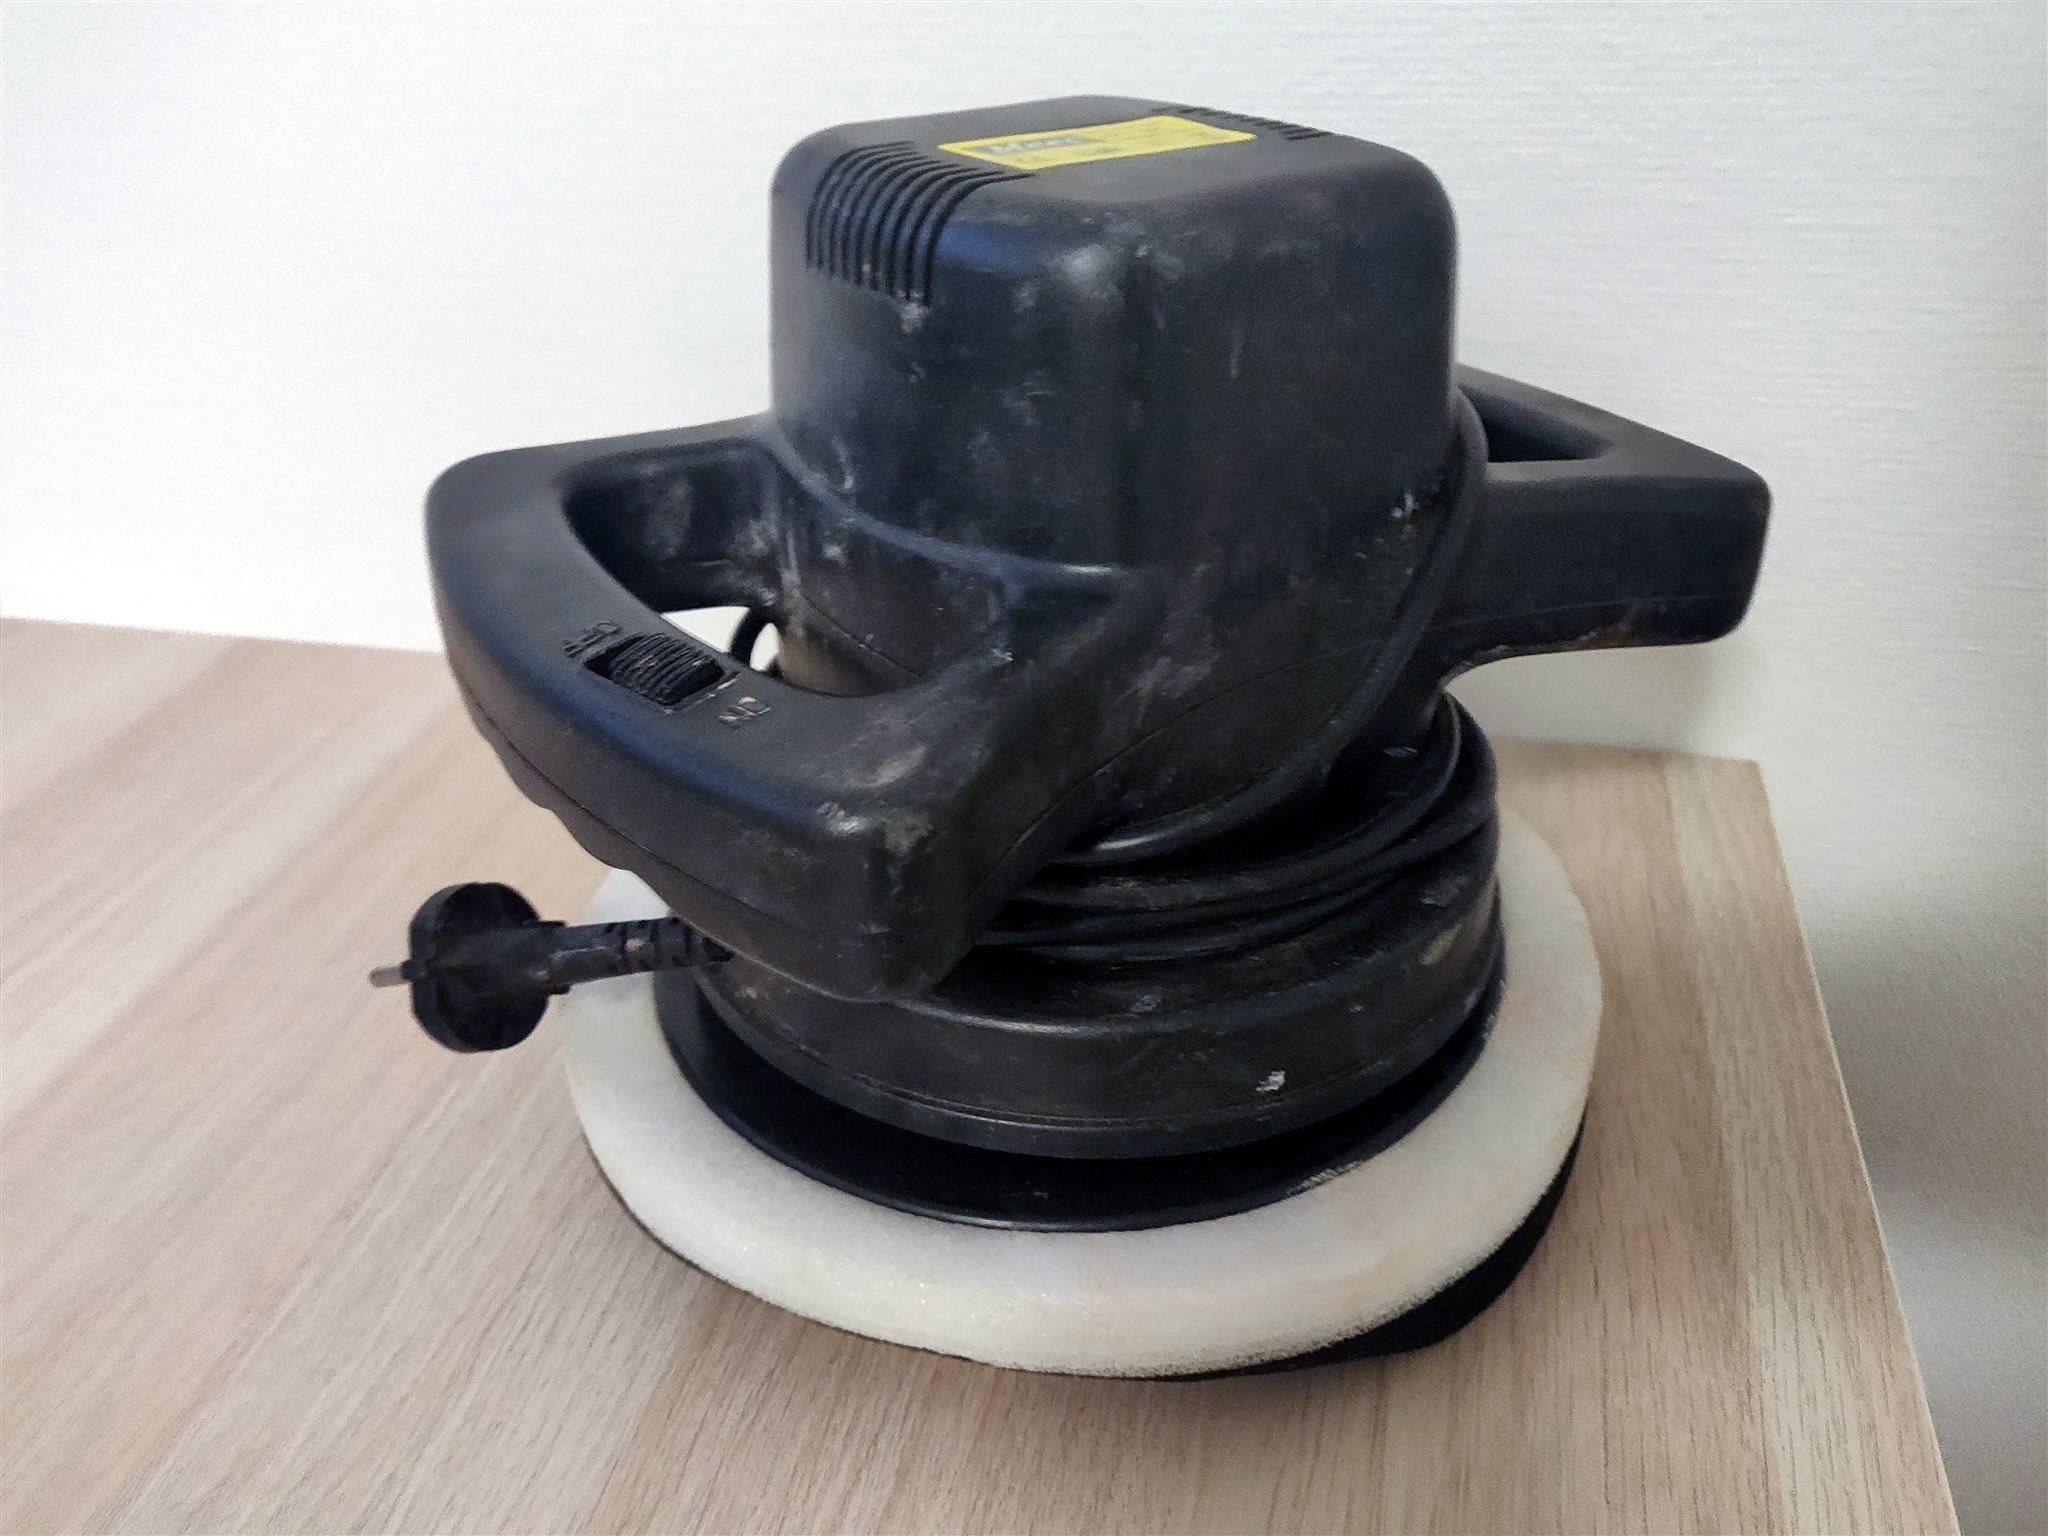 meec tools polermaskin